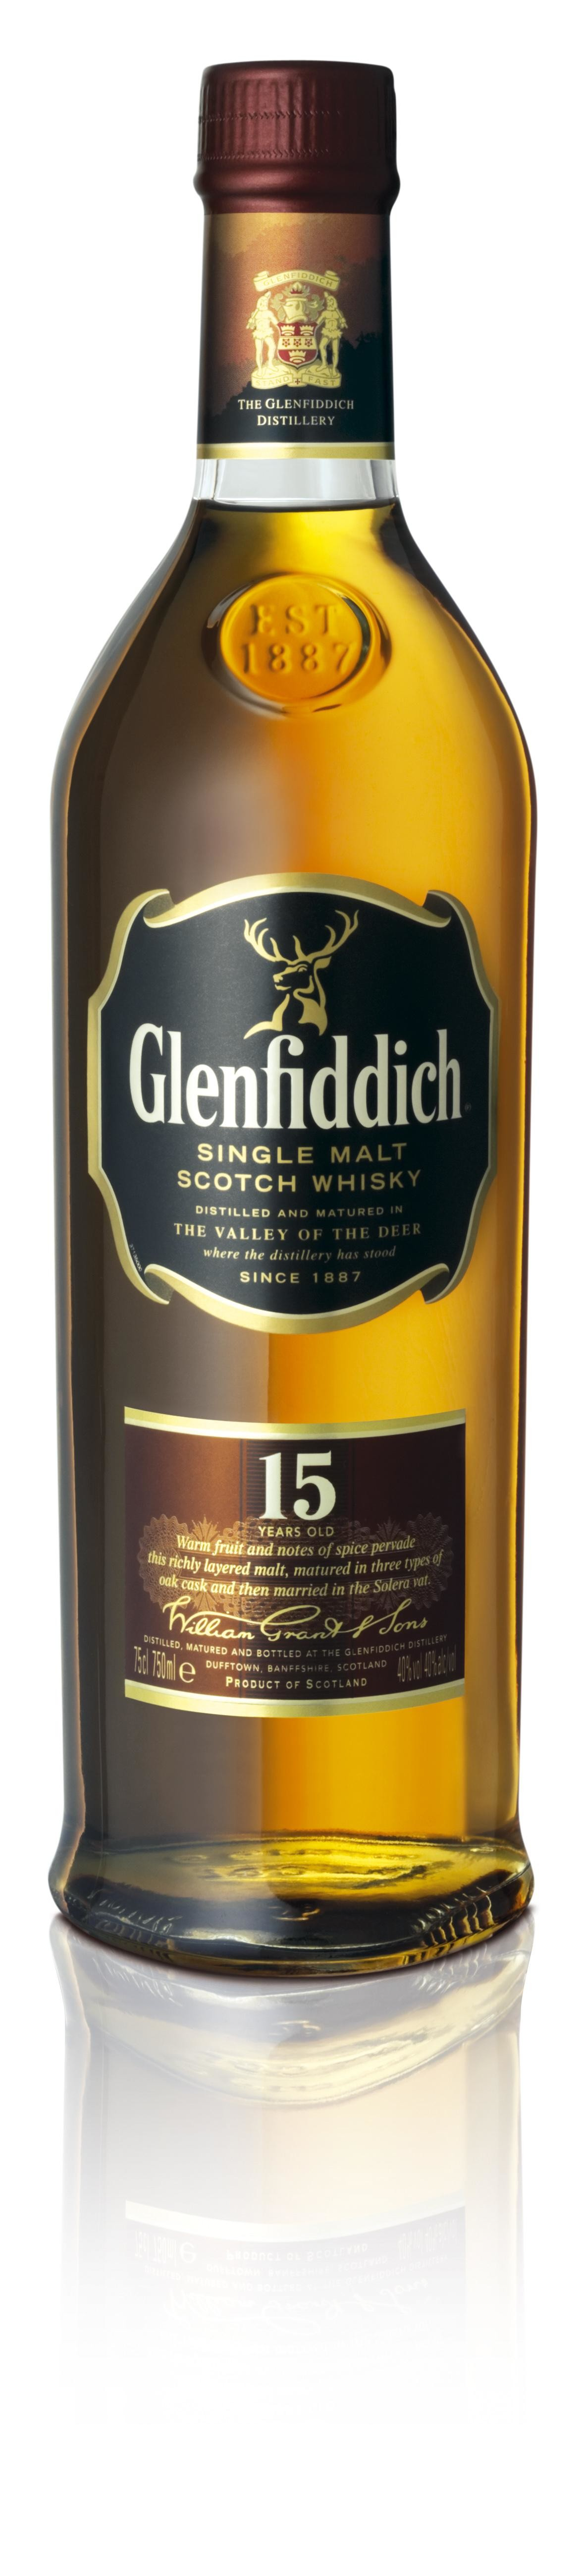 Glenfiddich 15Year 70cl 40% Speyside Single Malt Scotch Whisky